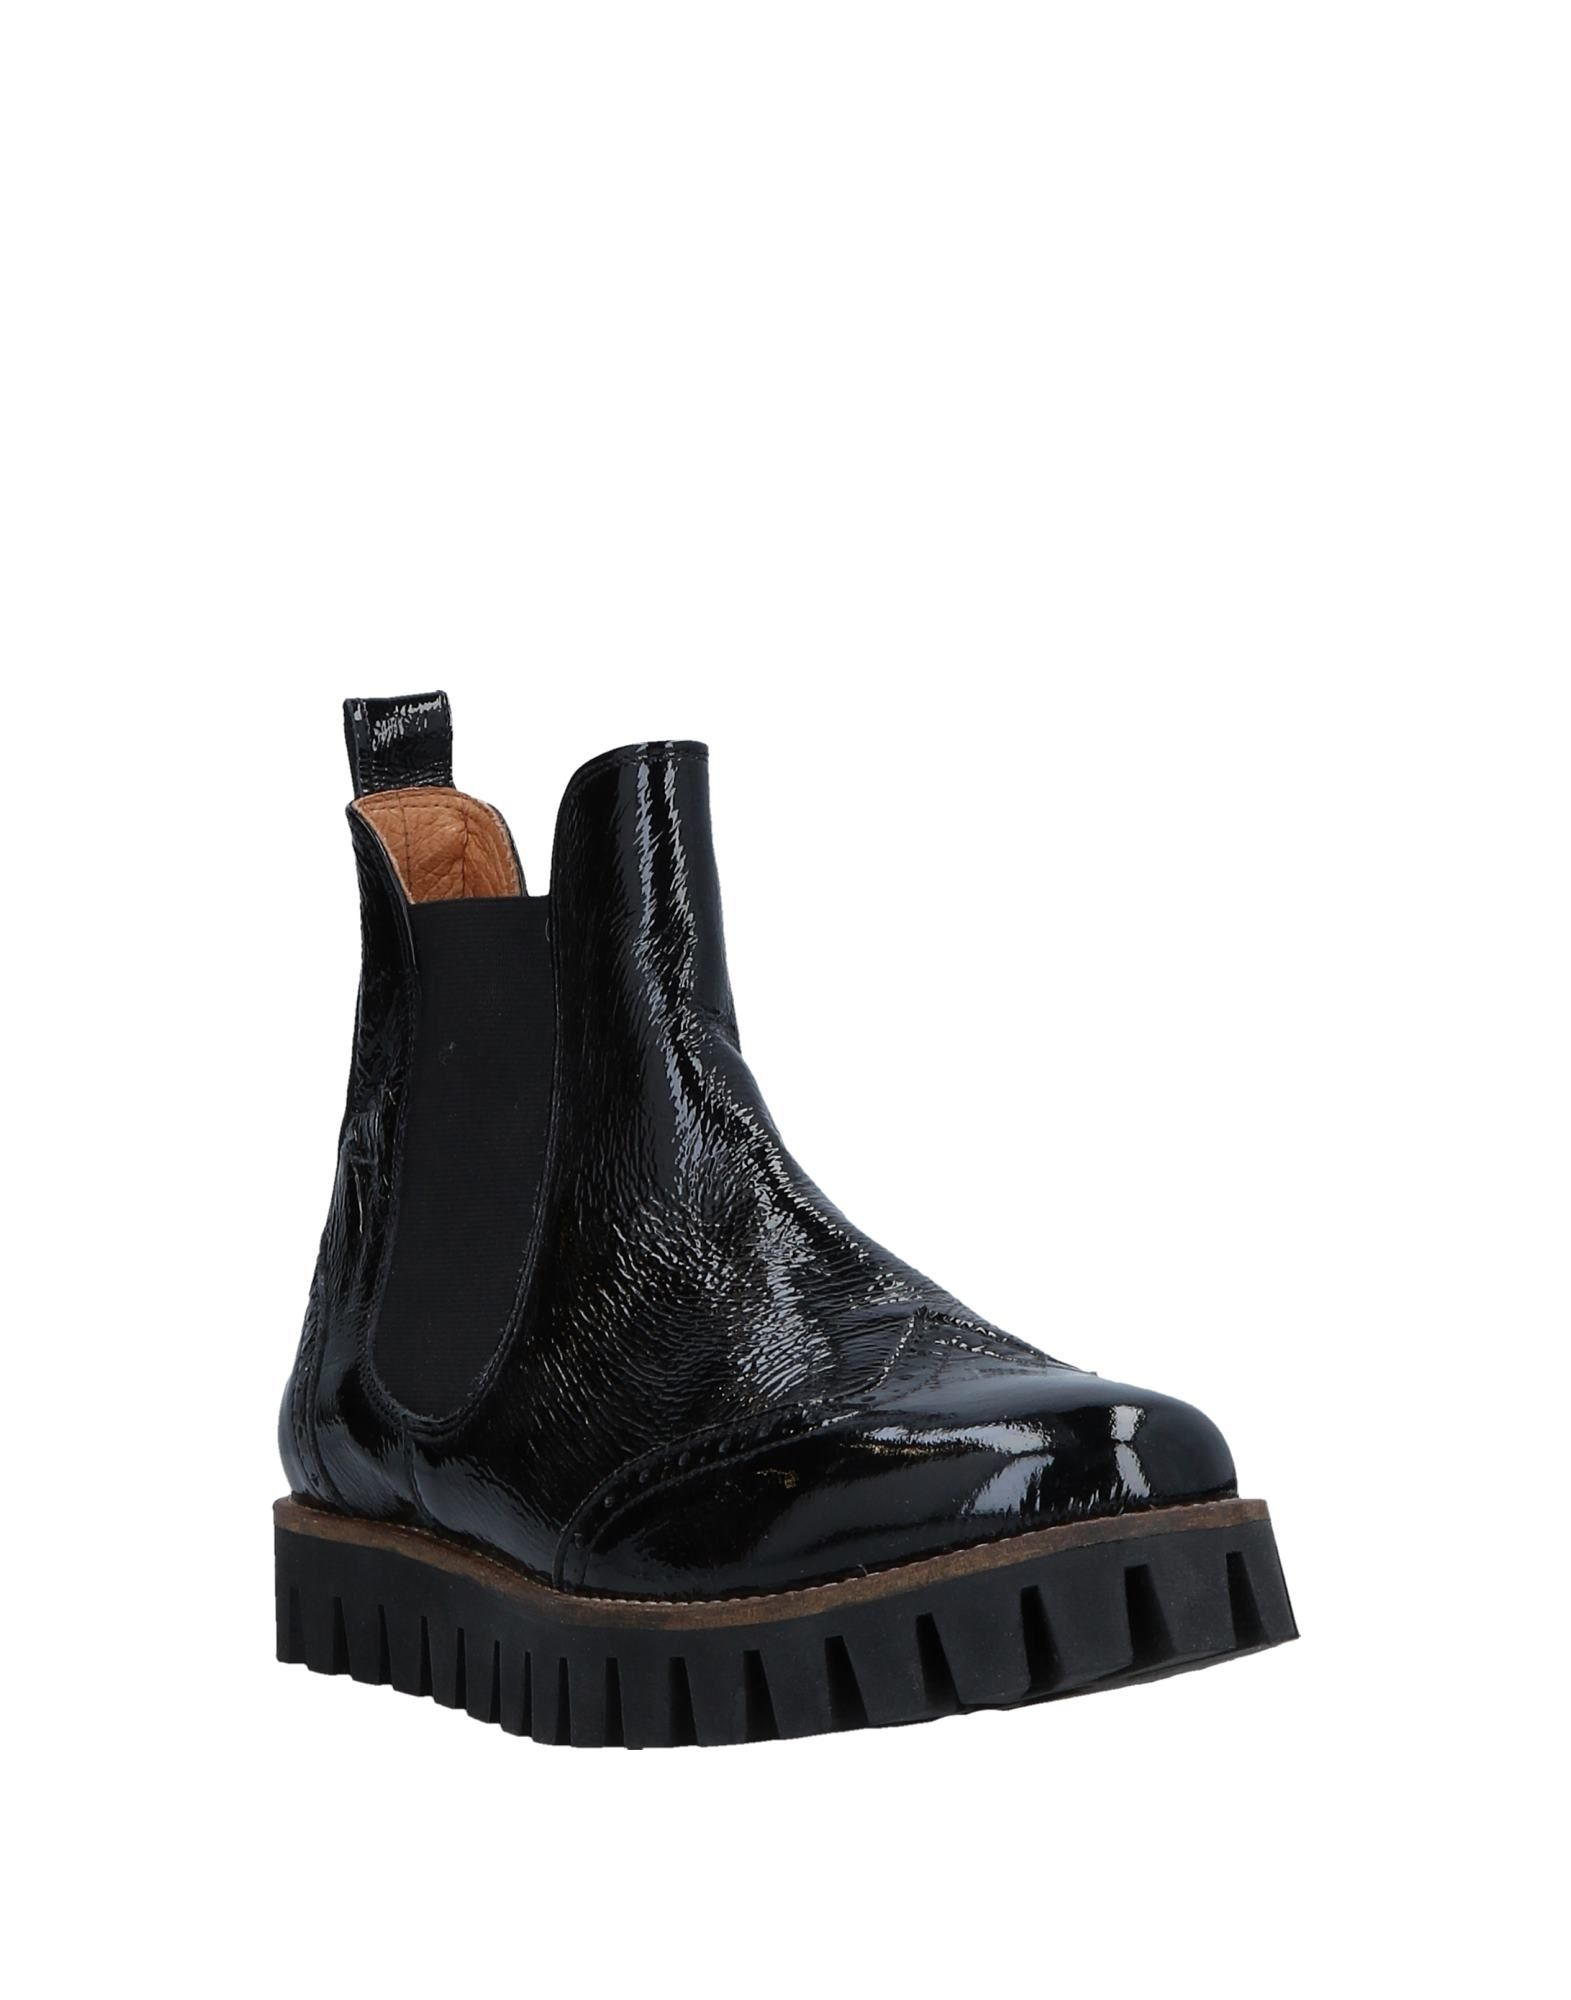 Ganni Ganni Ganni Ankle Boot - Women Ganni Ankle Boots online on  United Kingdom - 11532277JK 8128aa